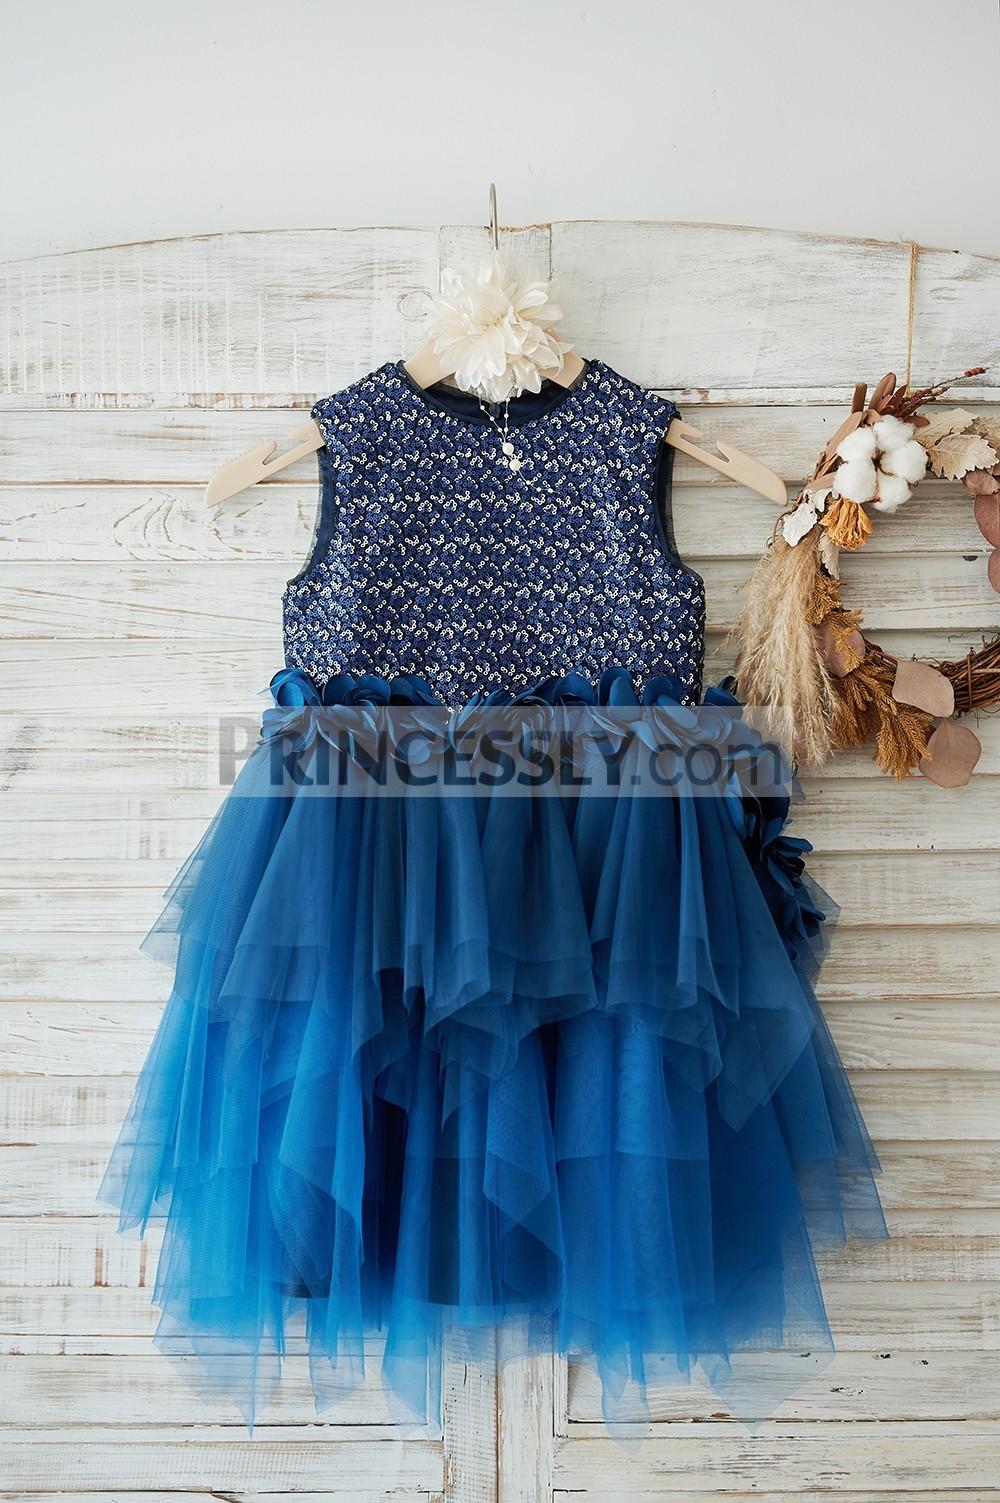 Navy blue / silver sequined navy blue tulle flower girl dress